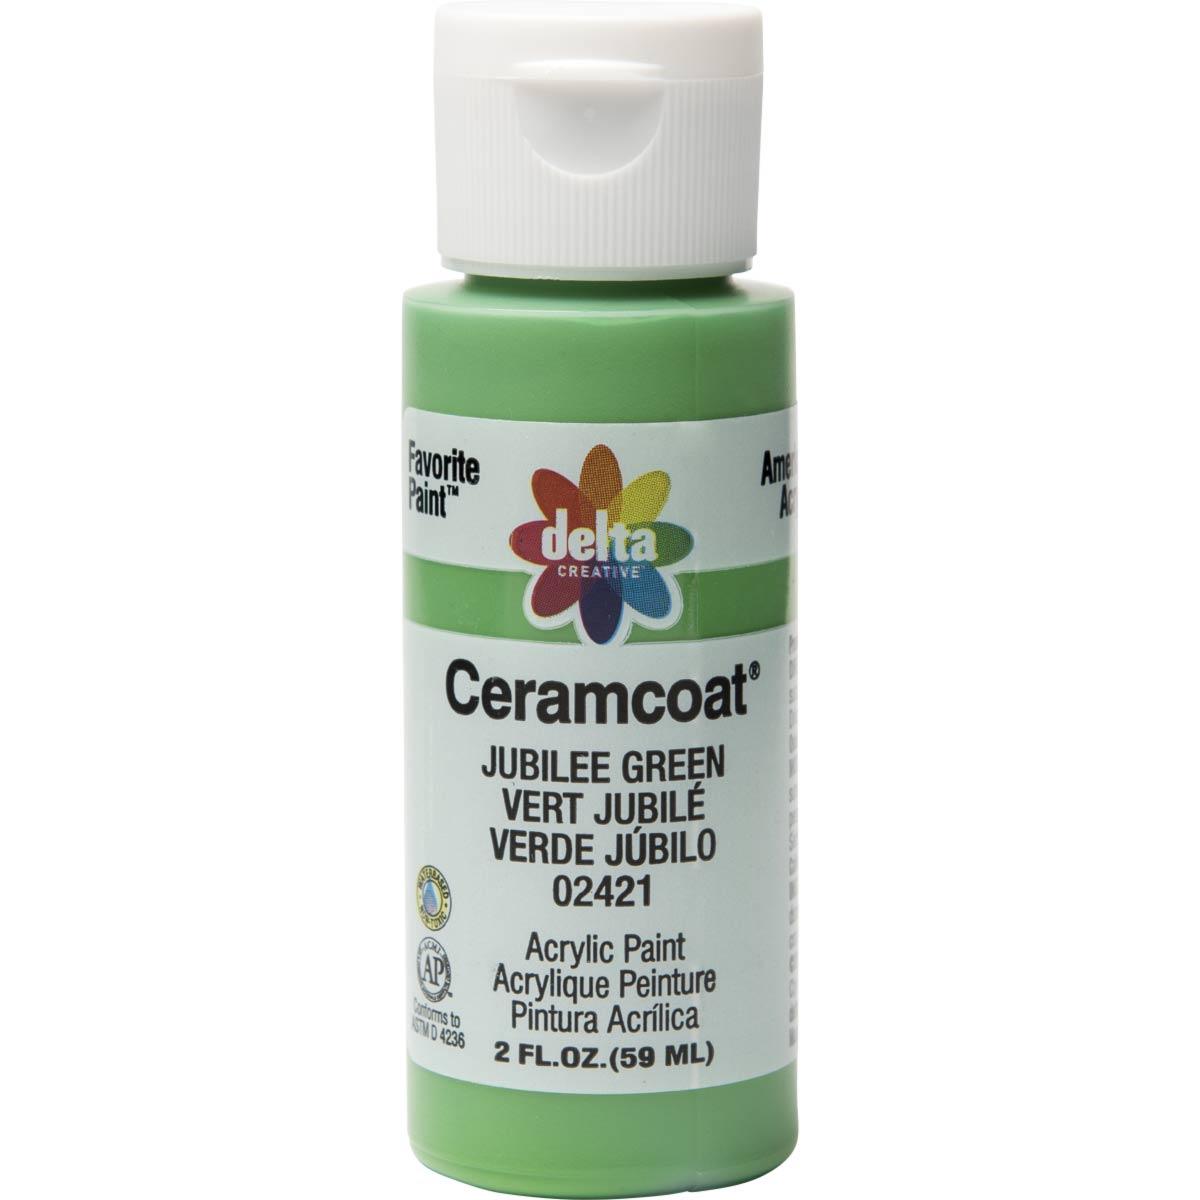 Delta Ceramcoat ® Acrylic Paint - Jubilee Green, 2 oz.